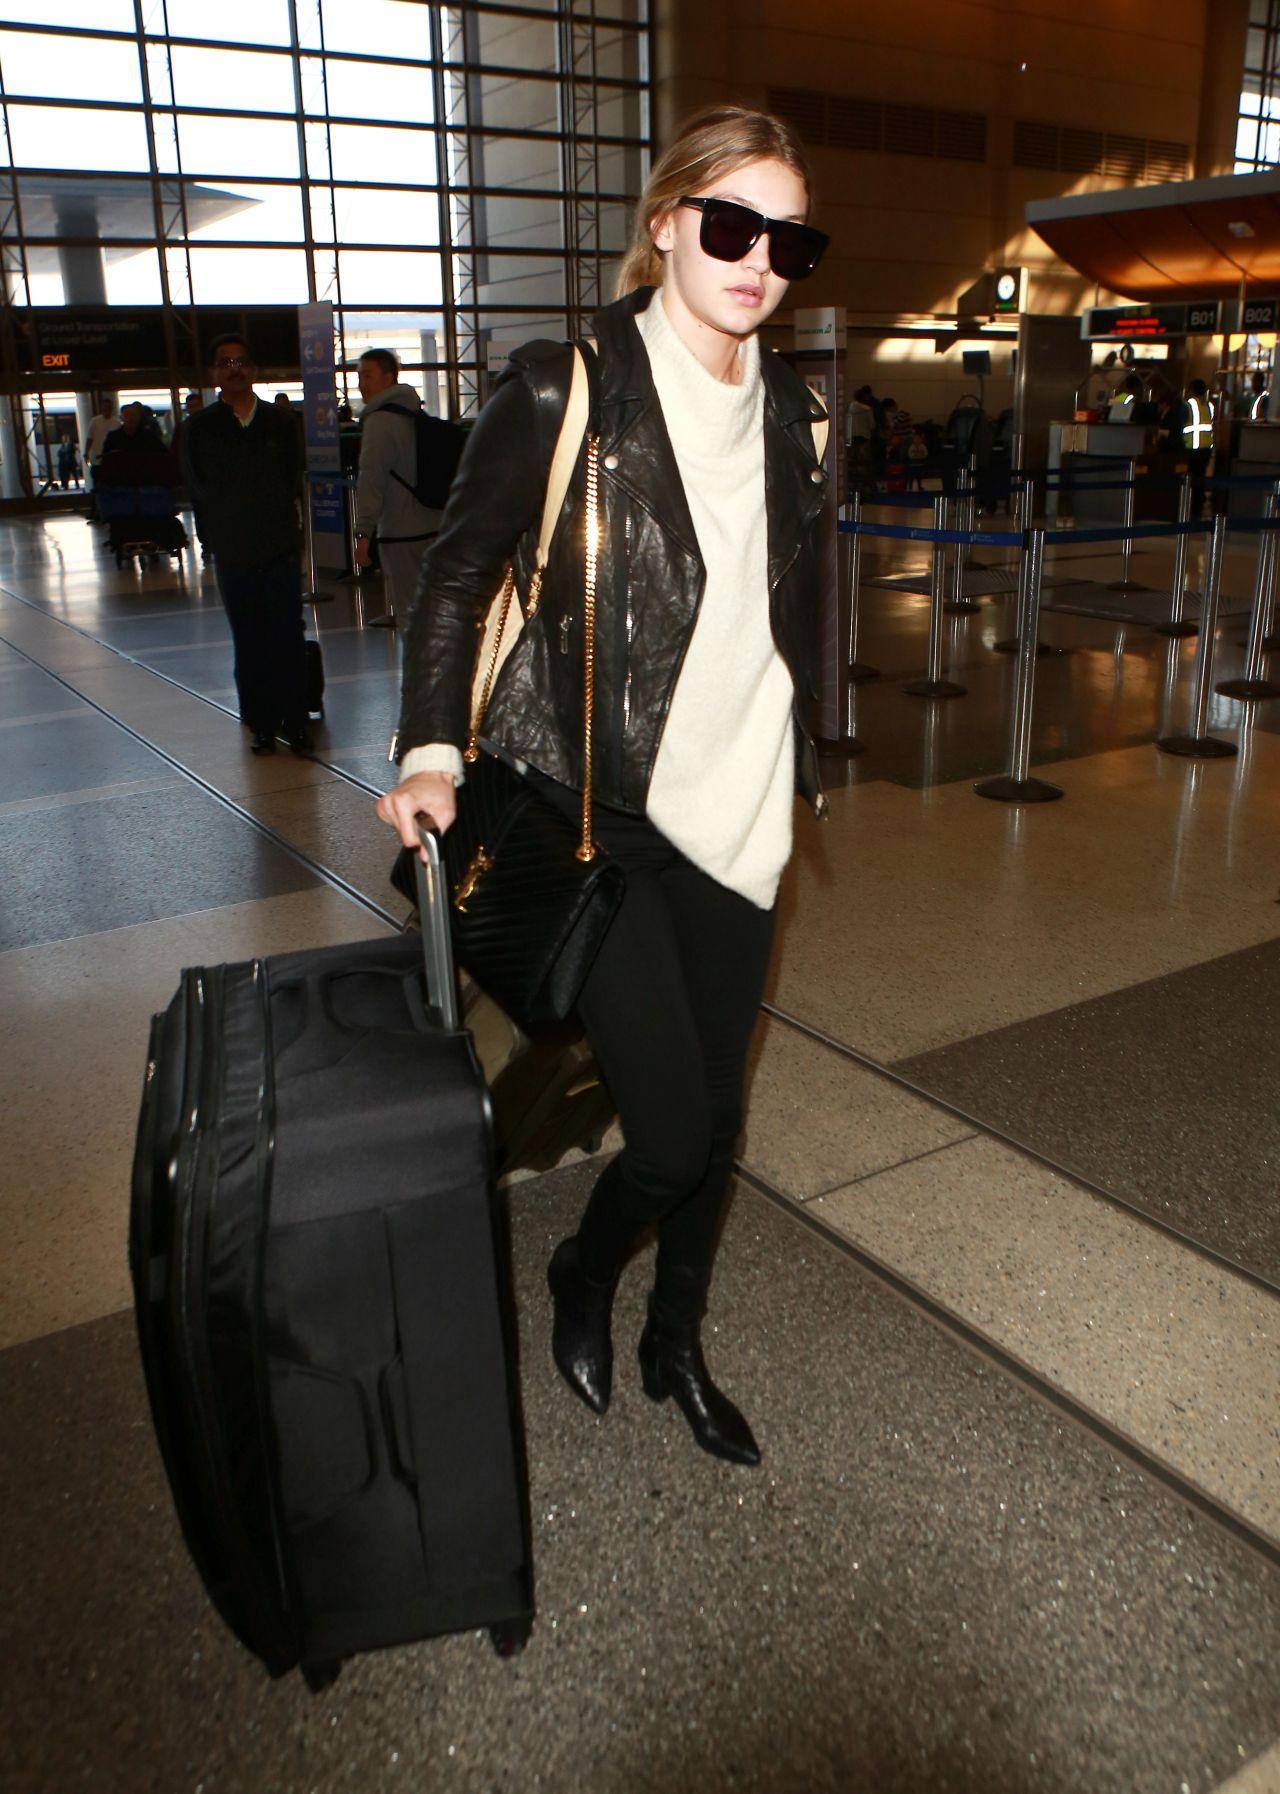 Gigi hadid at lax airport in los angeles naked (45 photo)